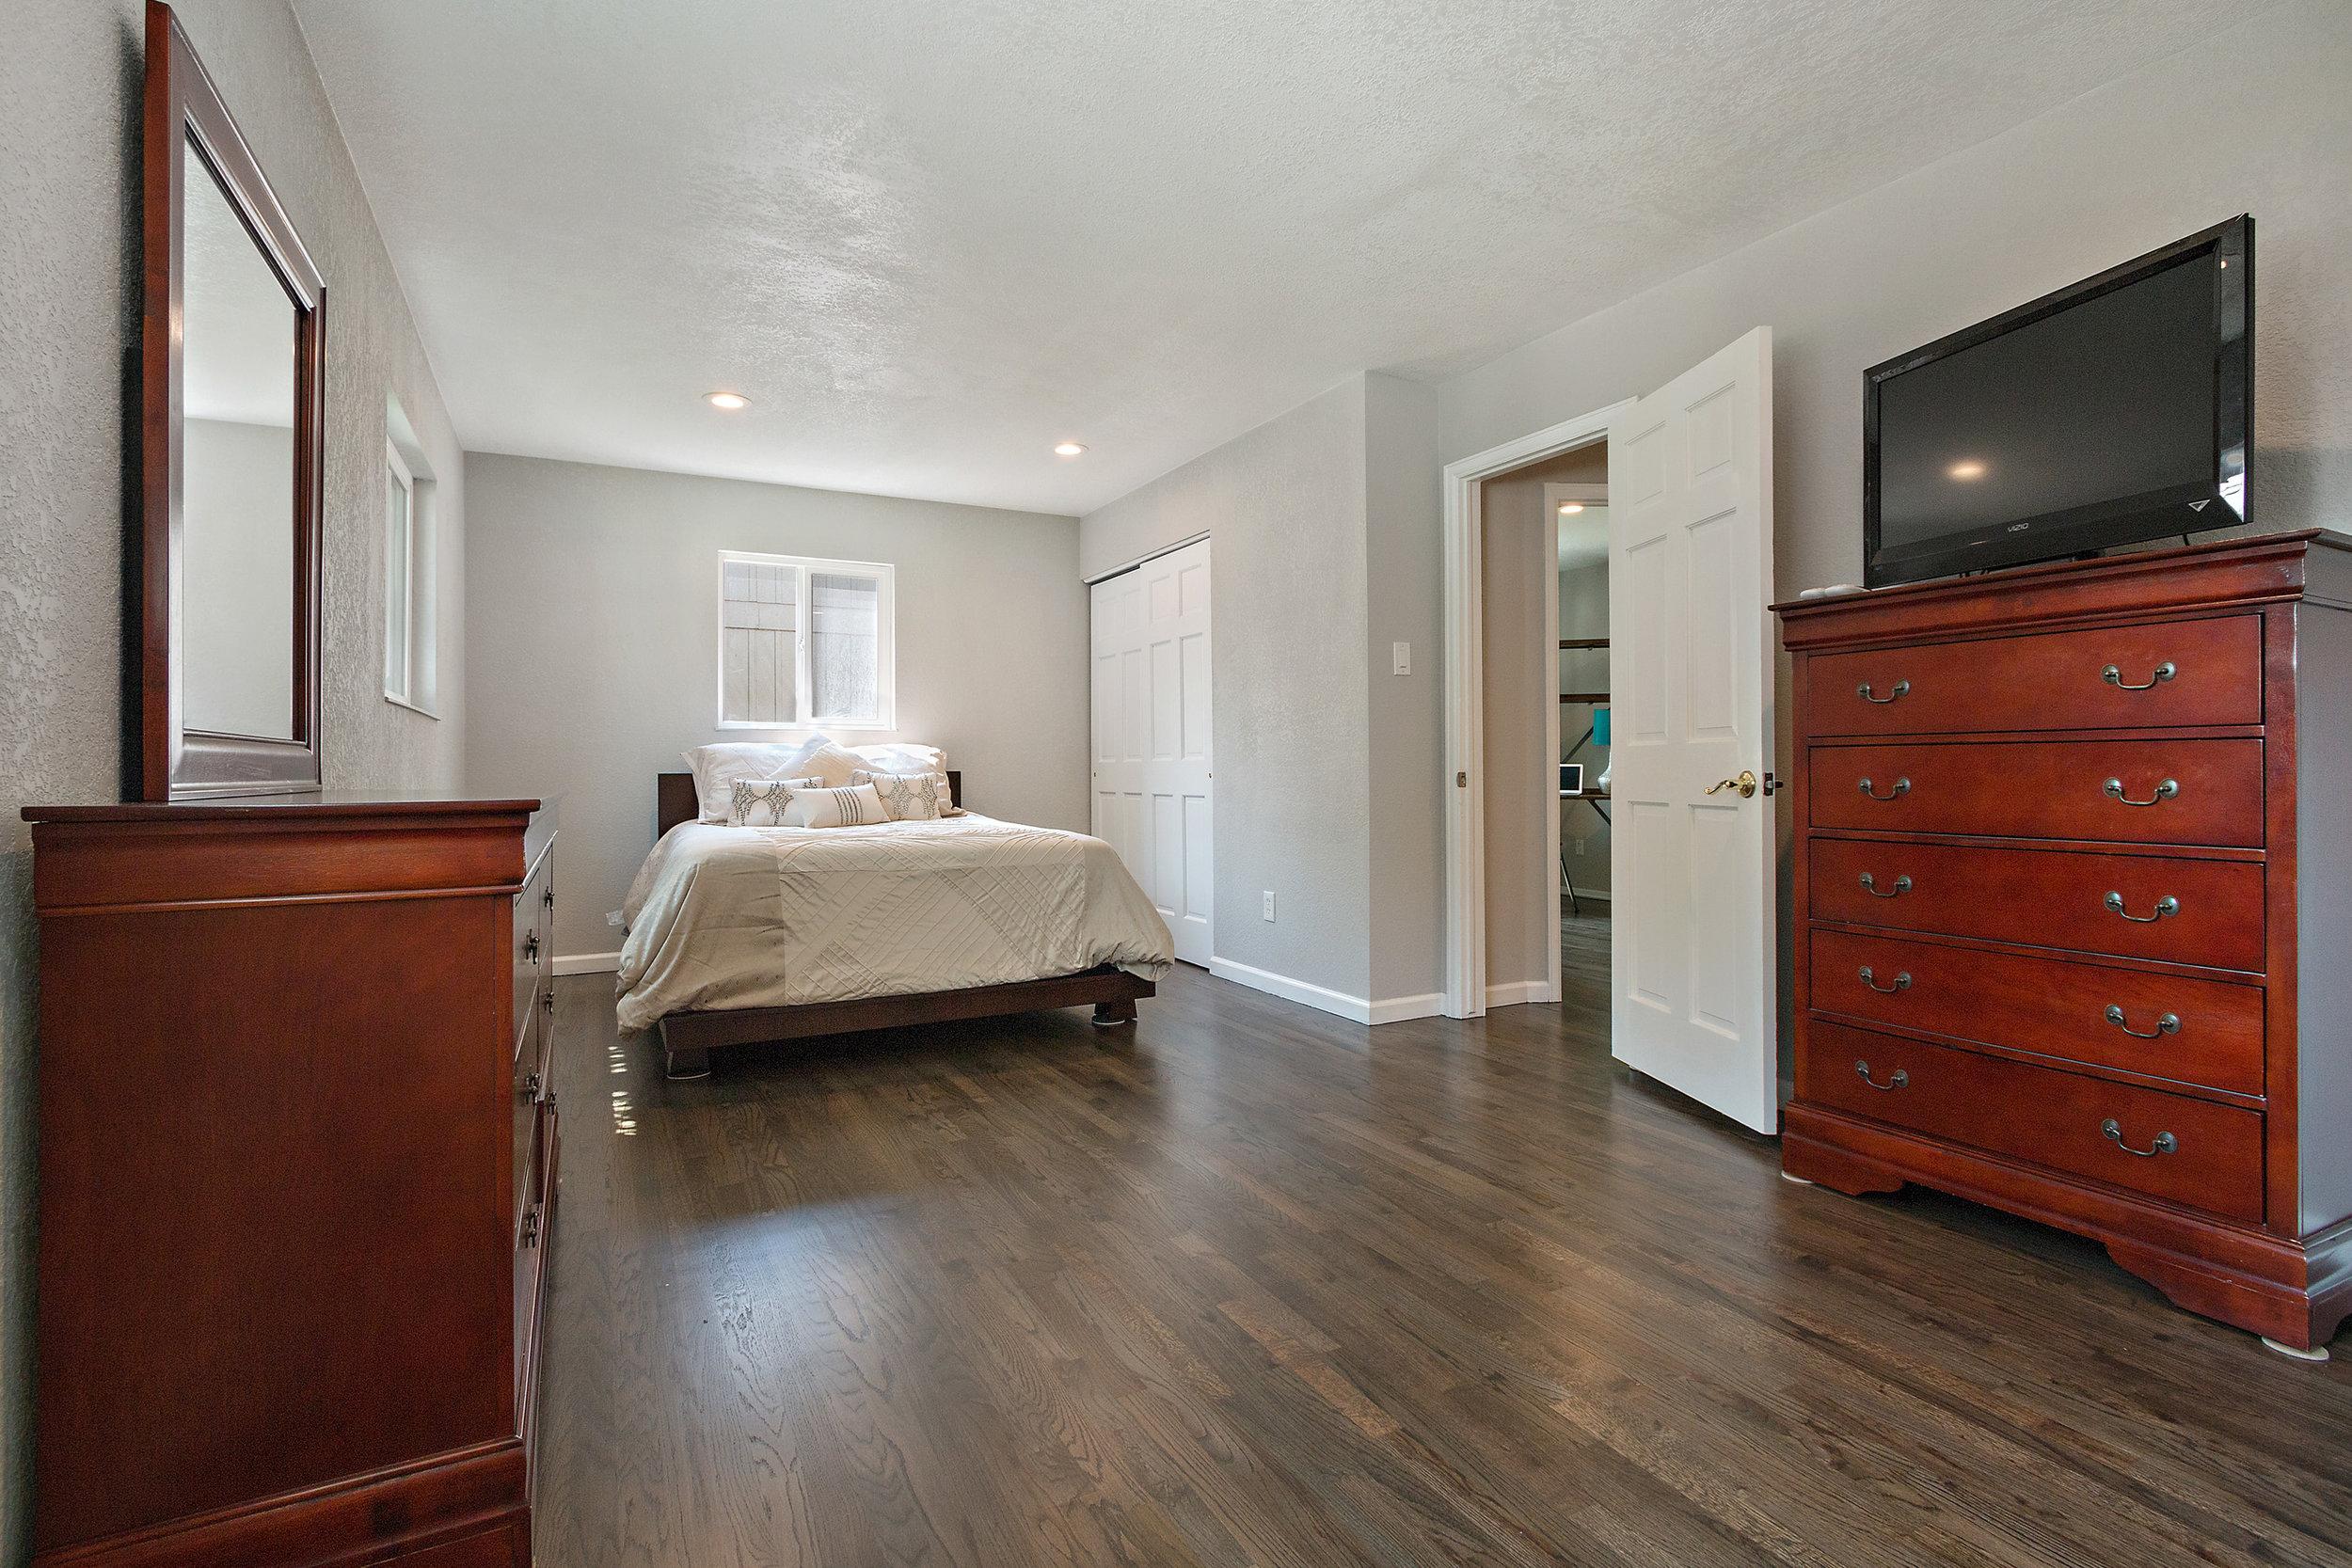 11-Bedroom 1.jpg